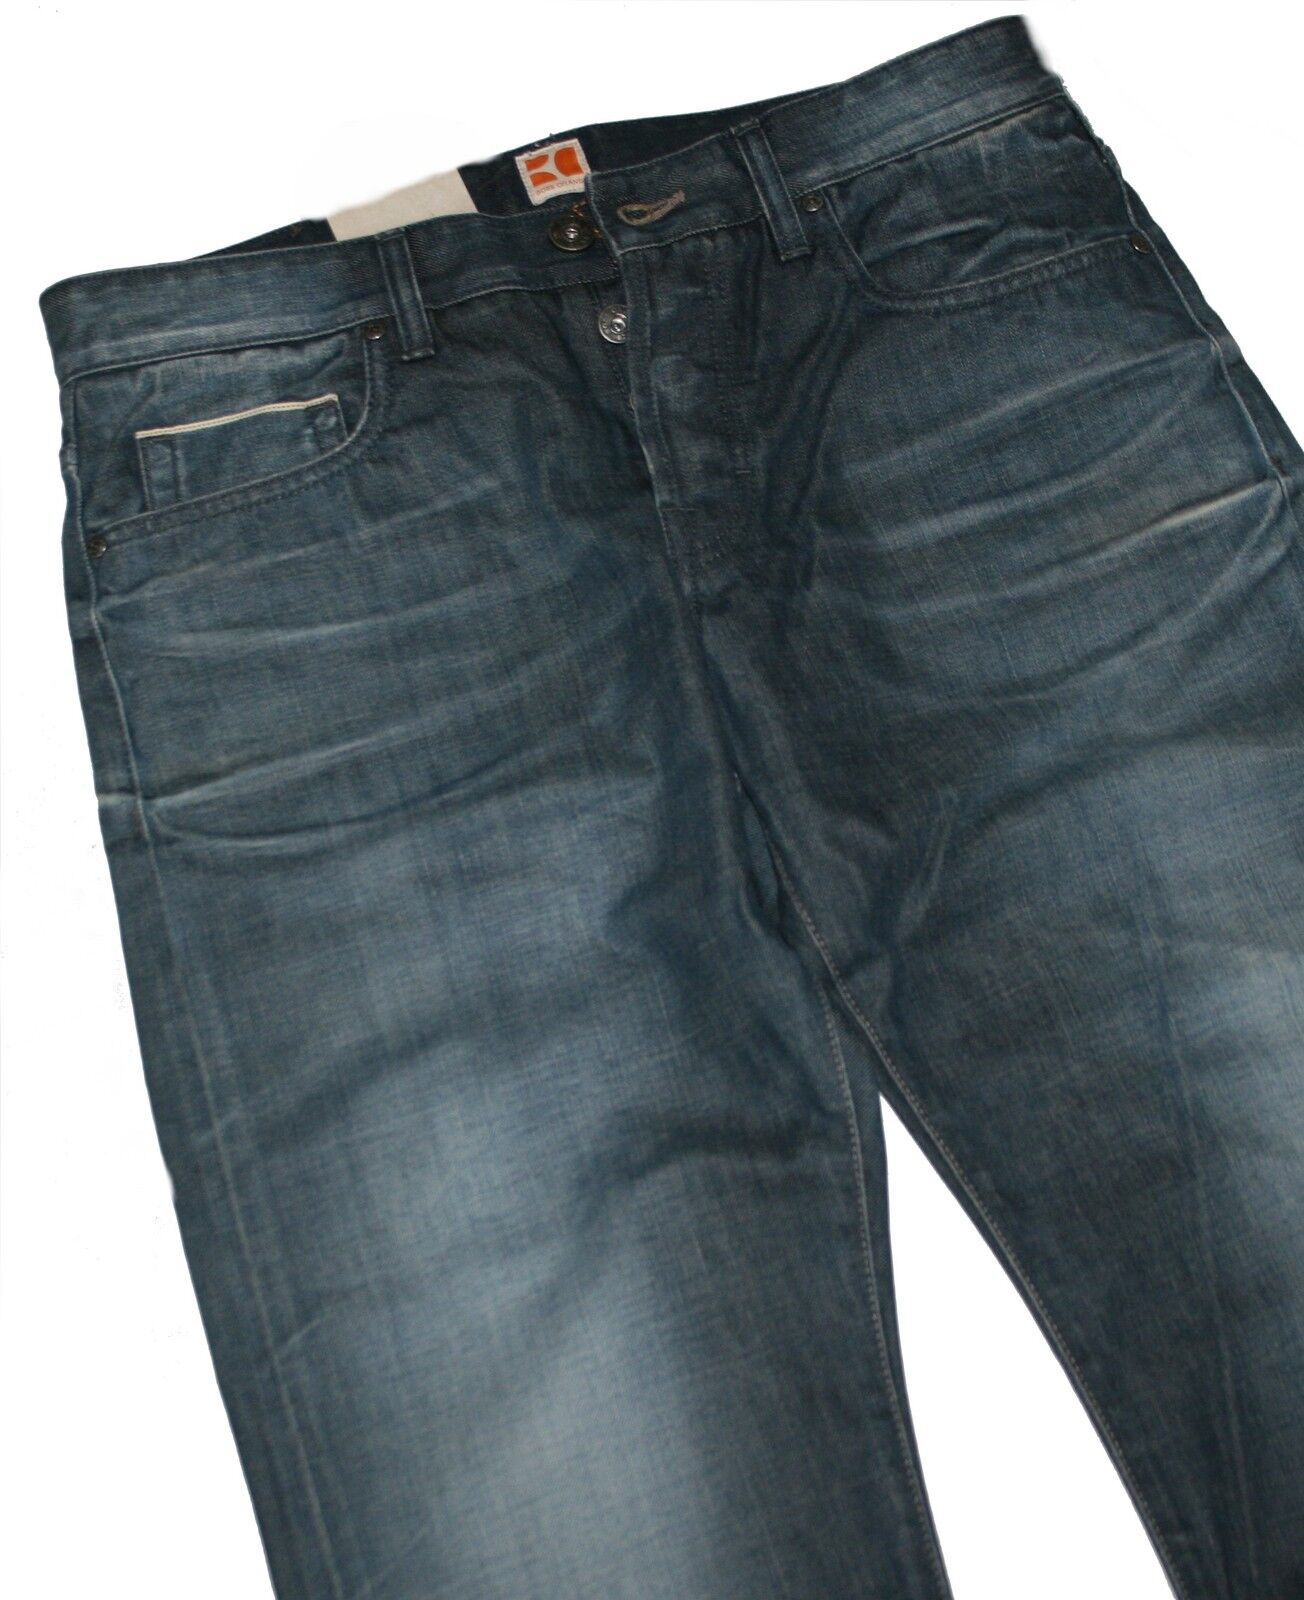 HUGO BOSS 50210361 MEDIO DENIM blue ARANCIONE 25 Cimosa Bash regular fit jeans